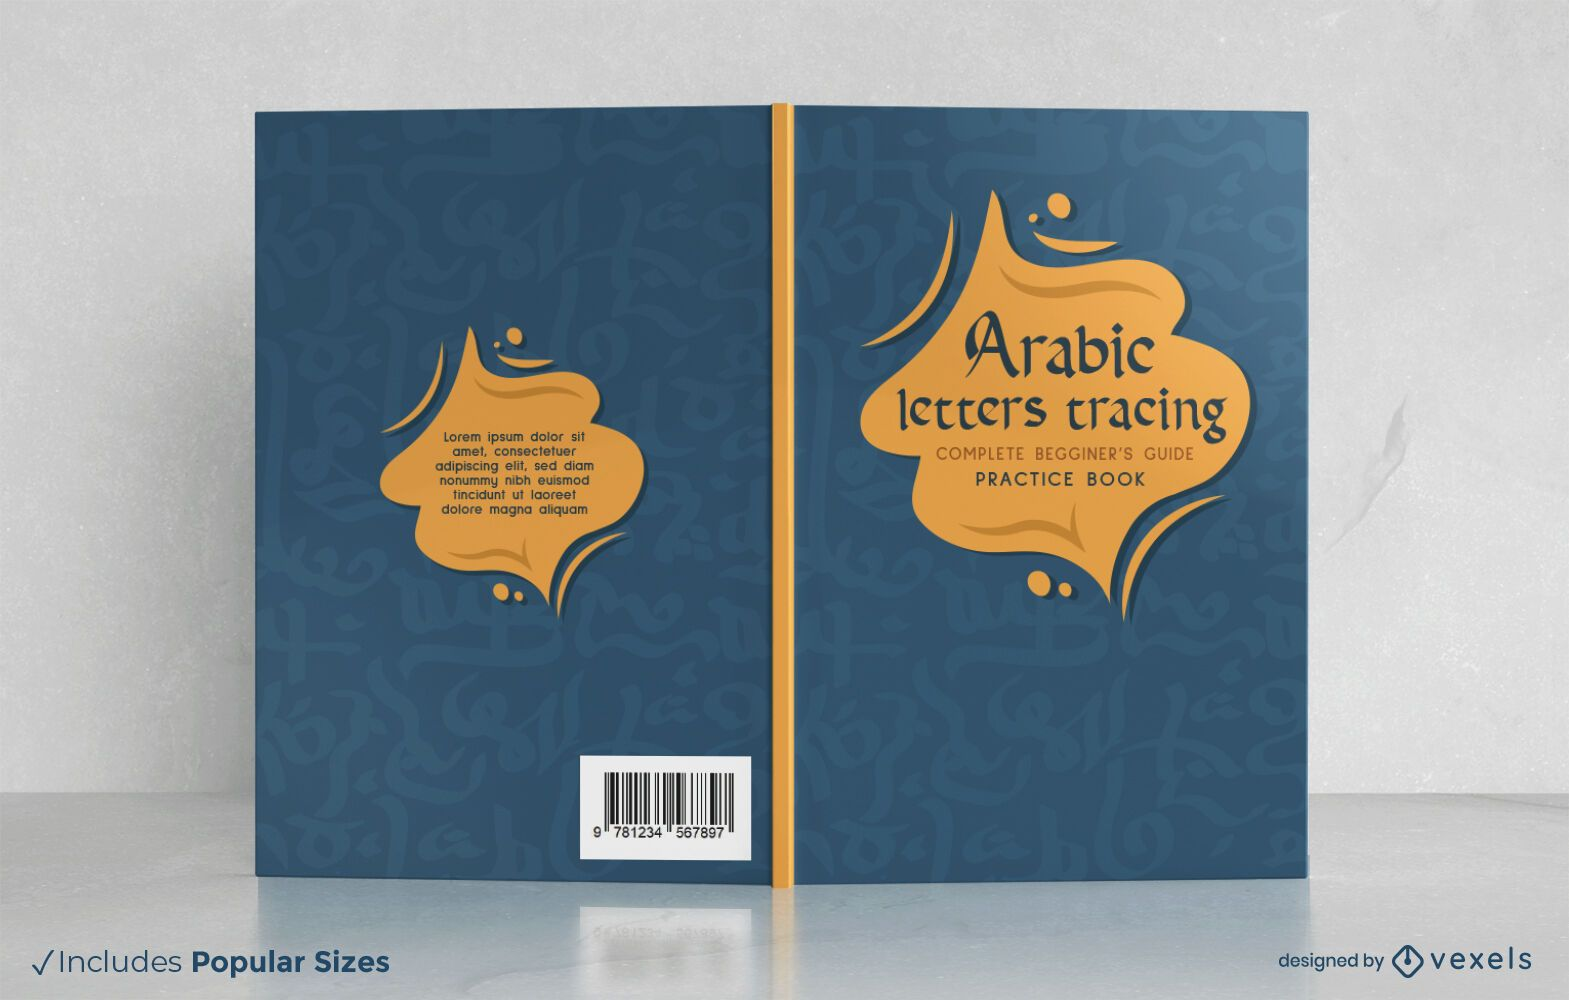 Arabic letters tracing book cover design